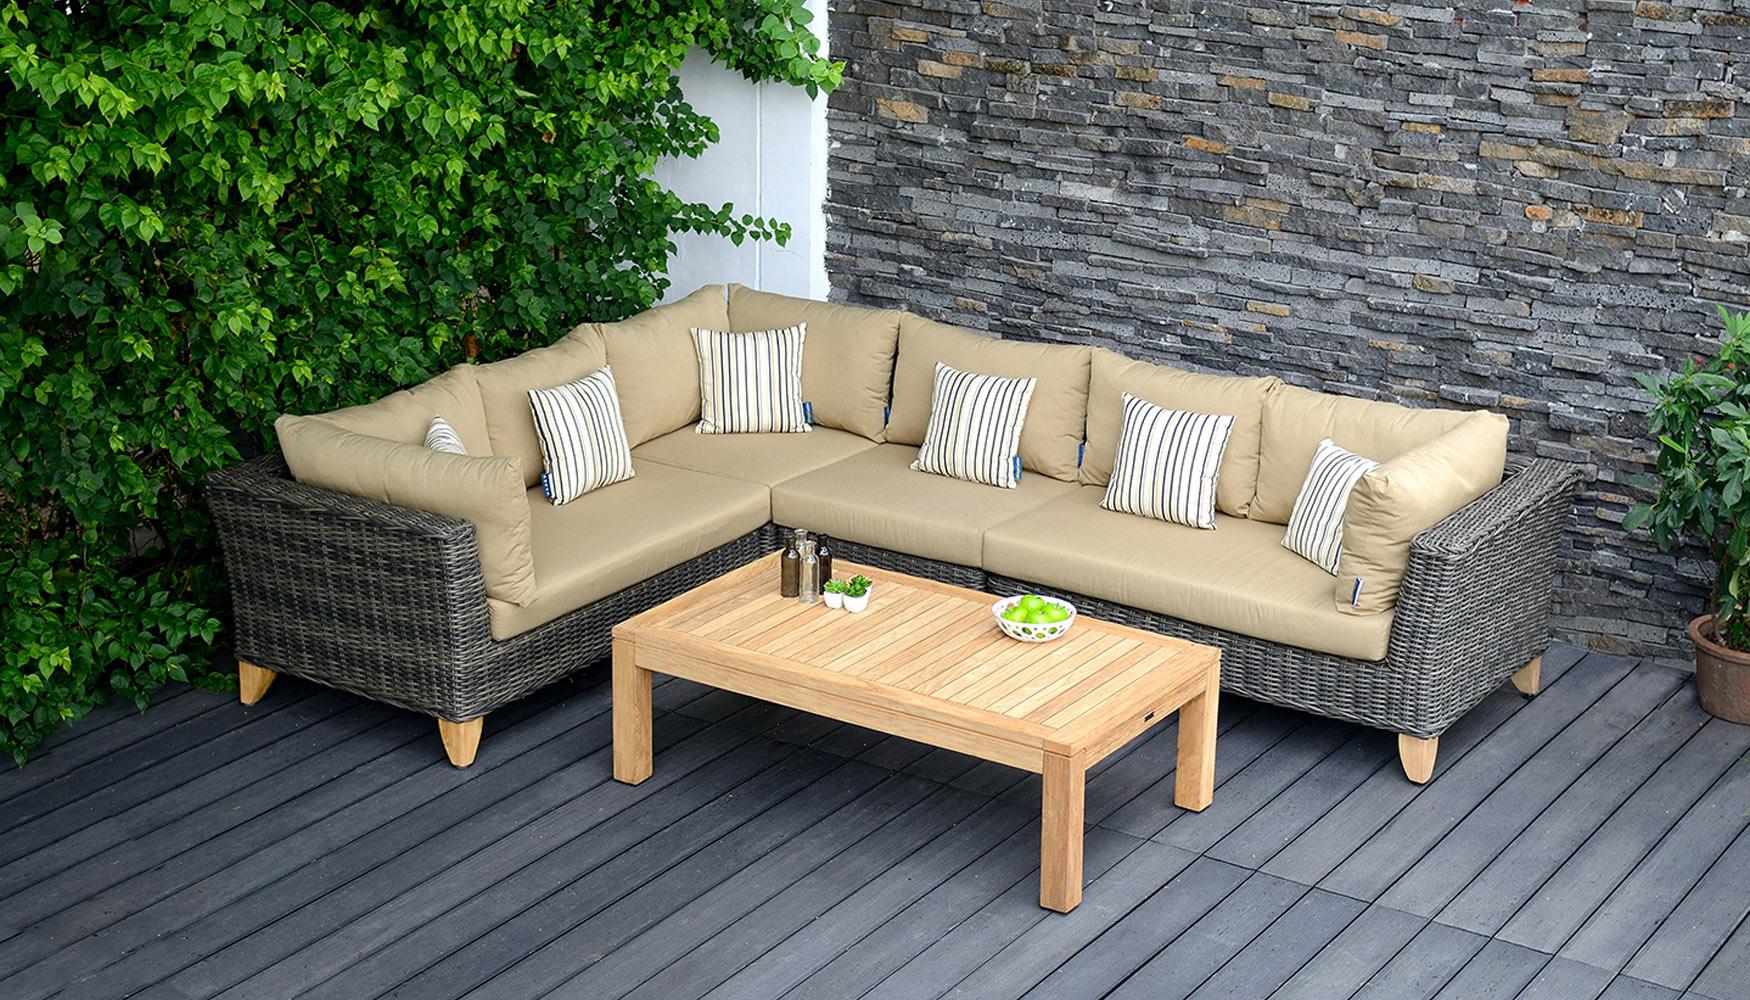 bauhaus sofas cama best quality sofa beds melbourne a disfrutar del exterior con ferretería